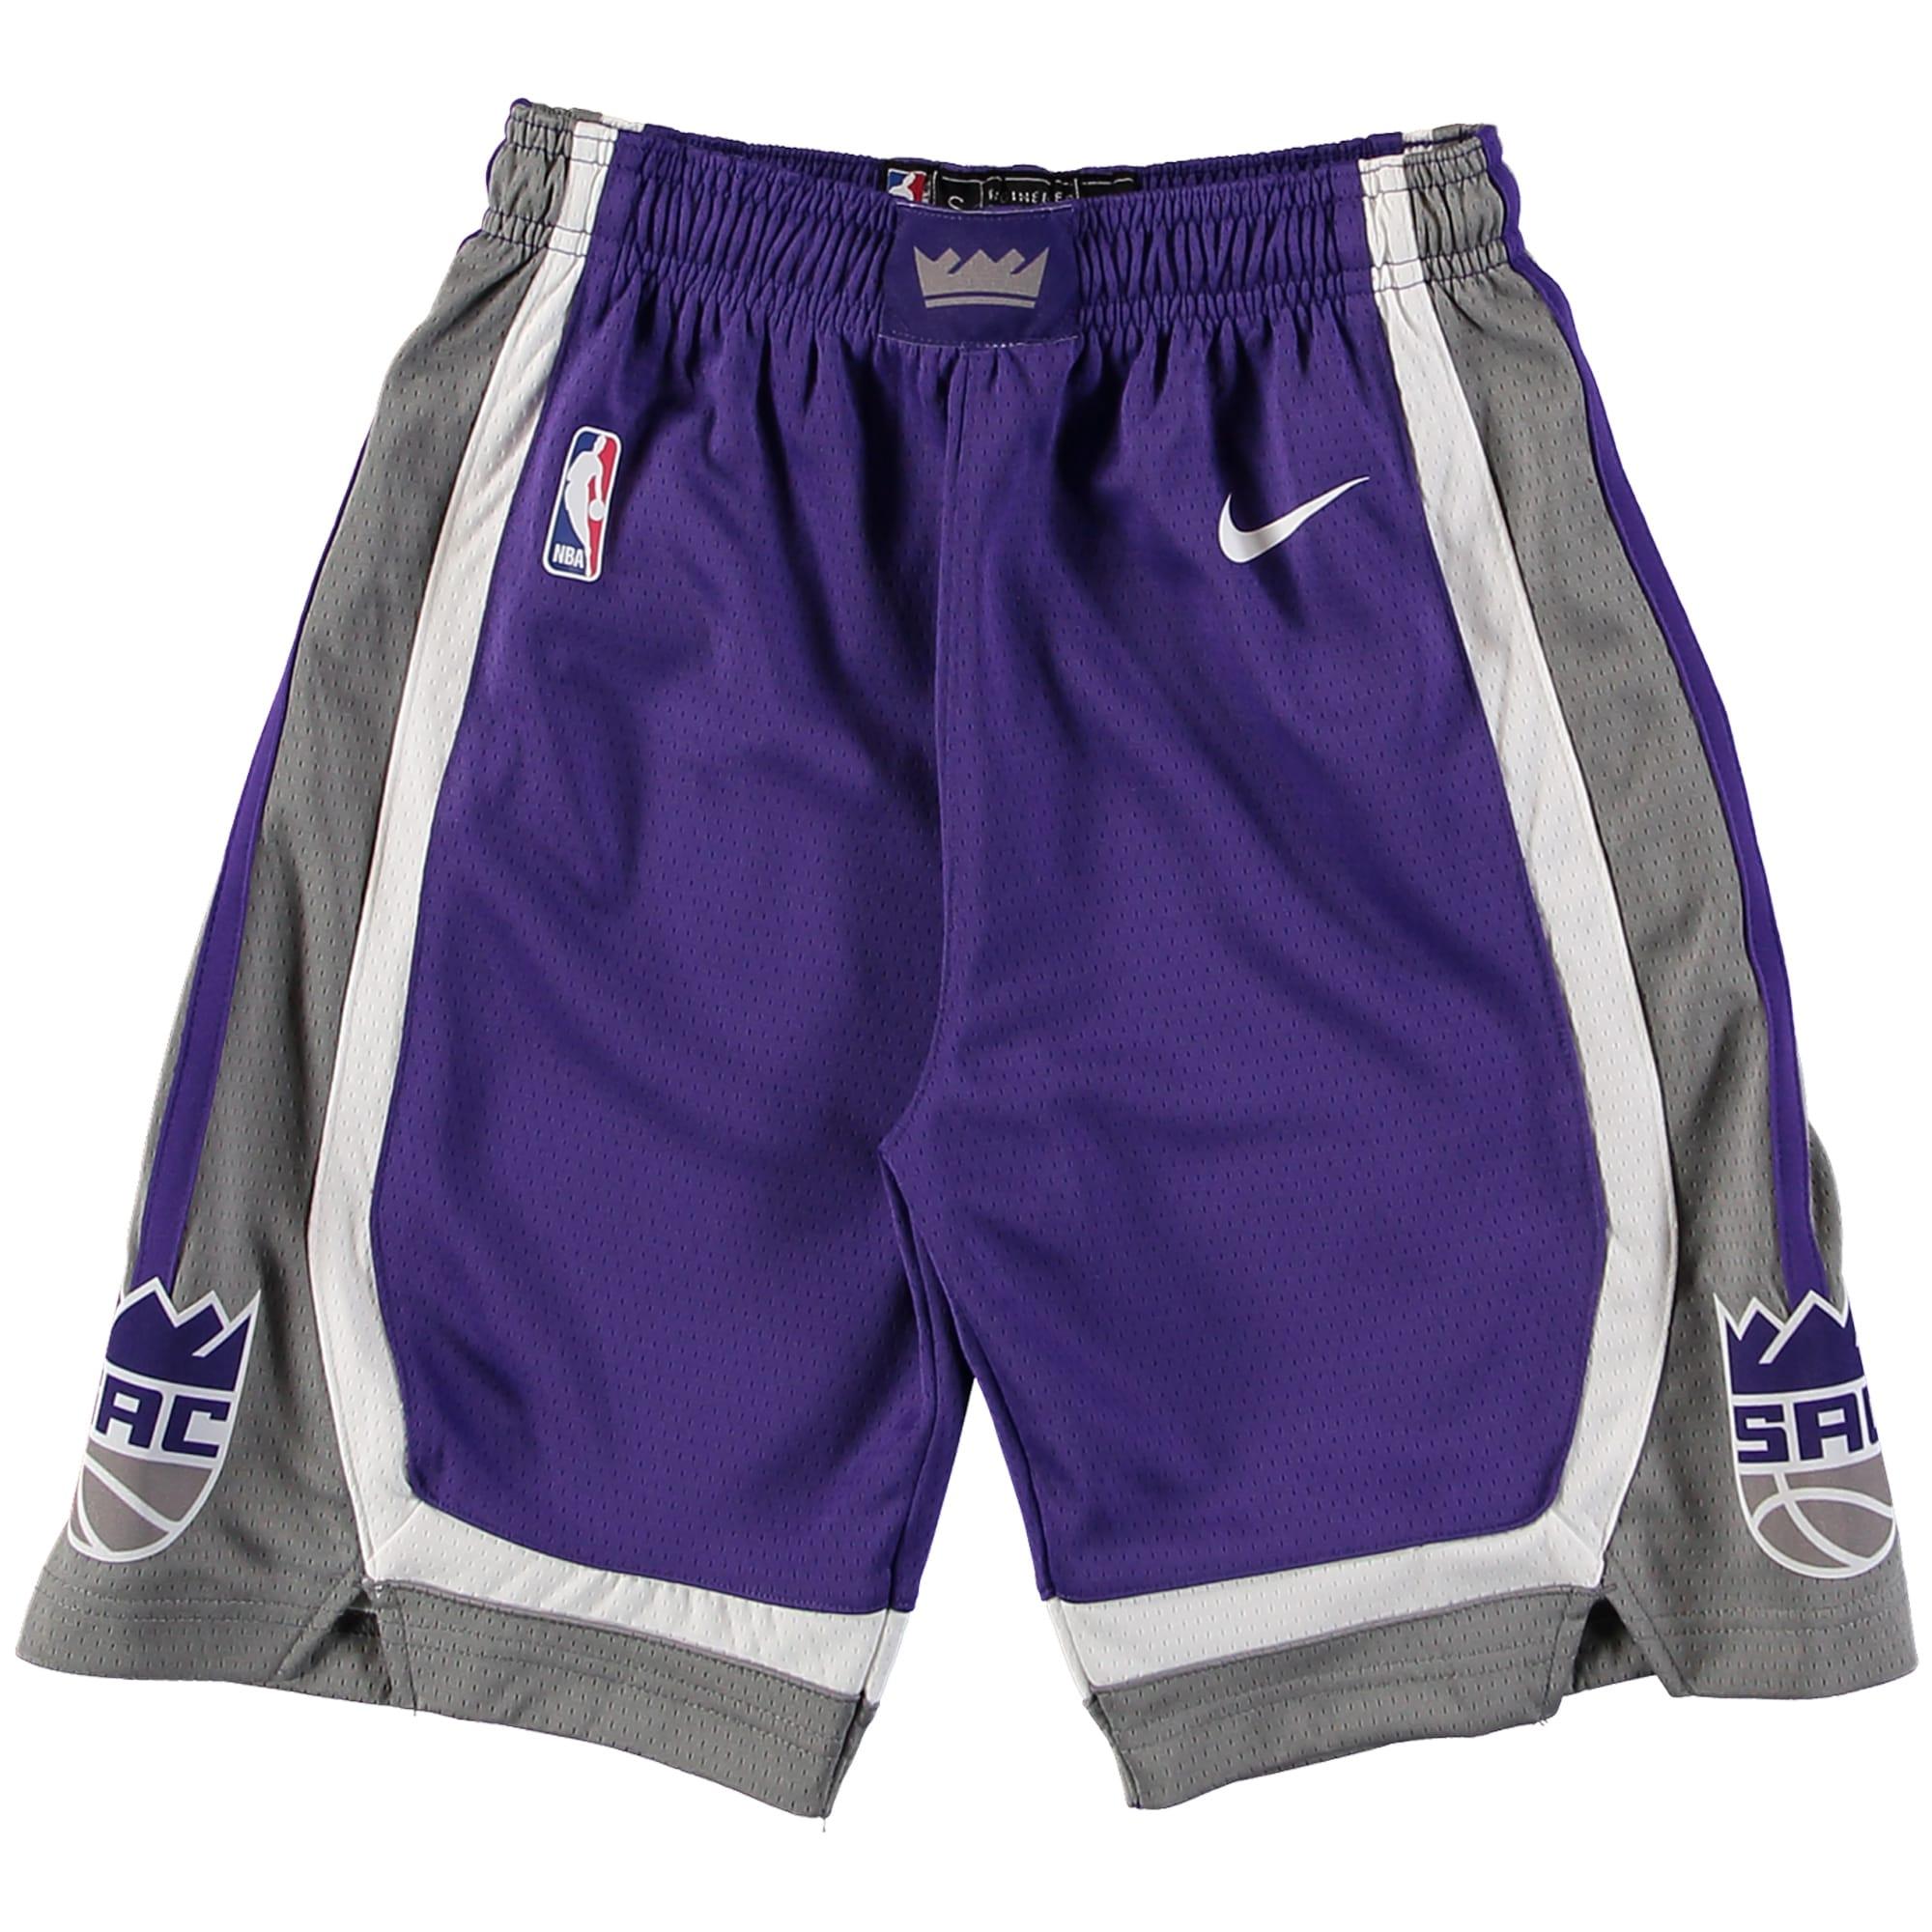 Sacramento Kings Nike Youth Swingman Icon Performance Shorts - Purple/Gray